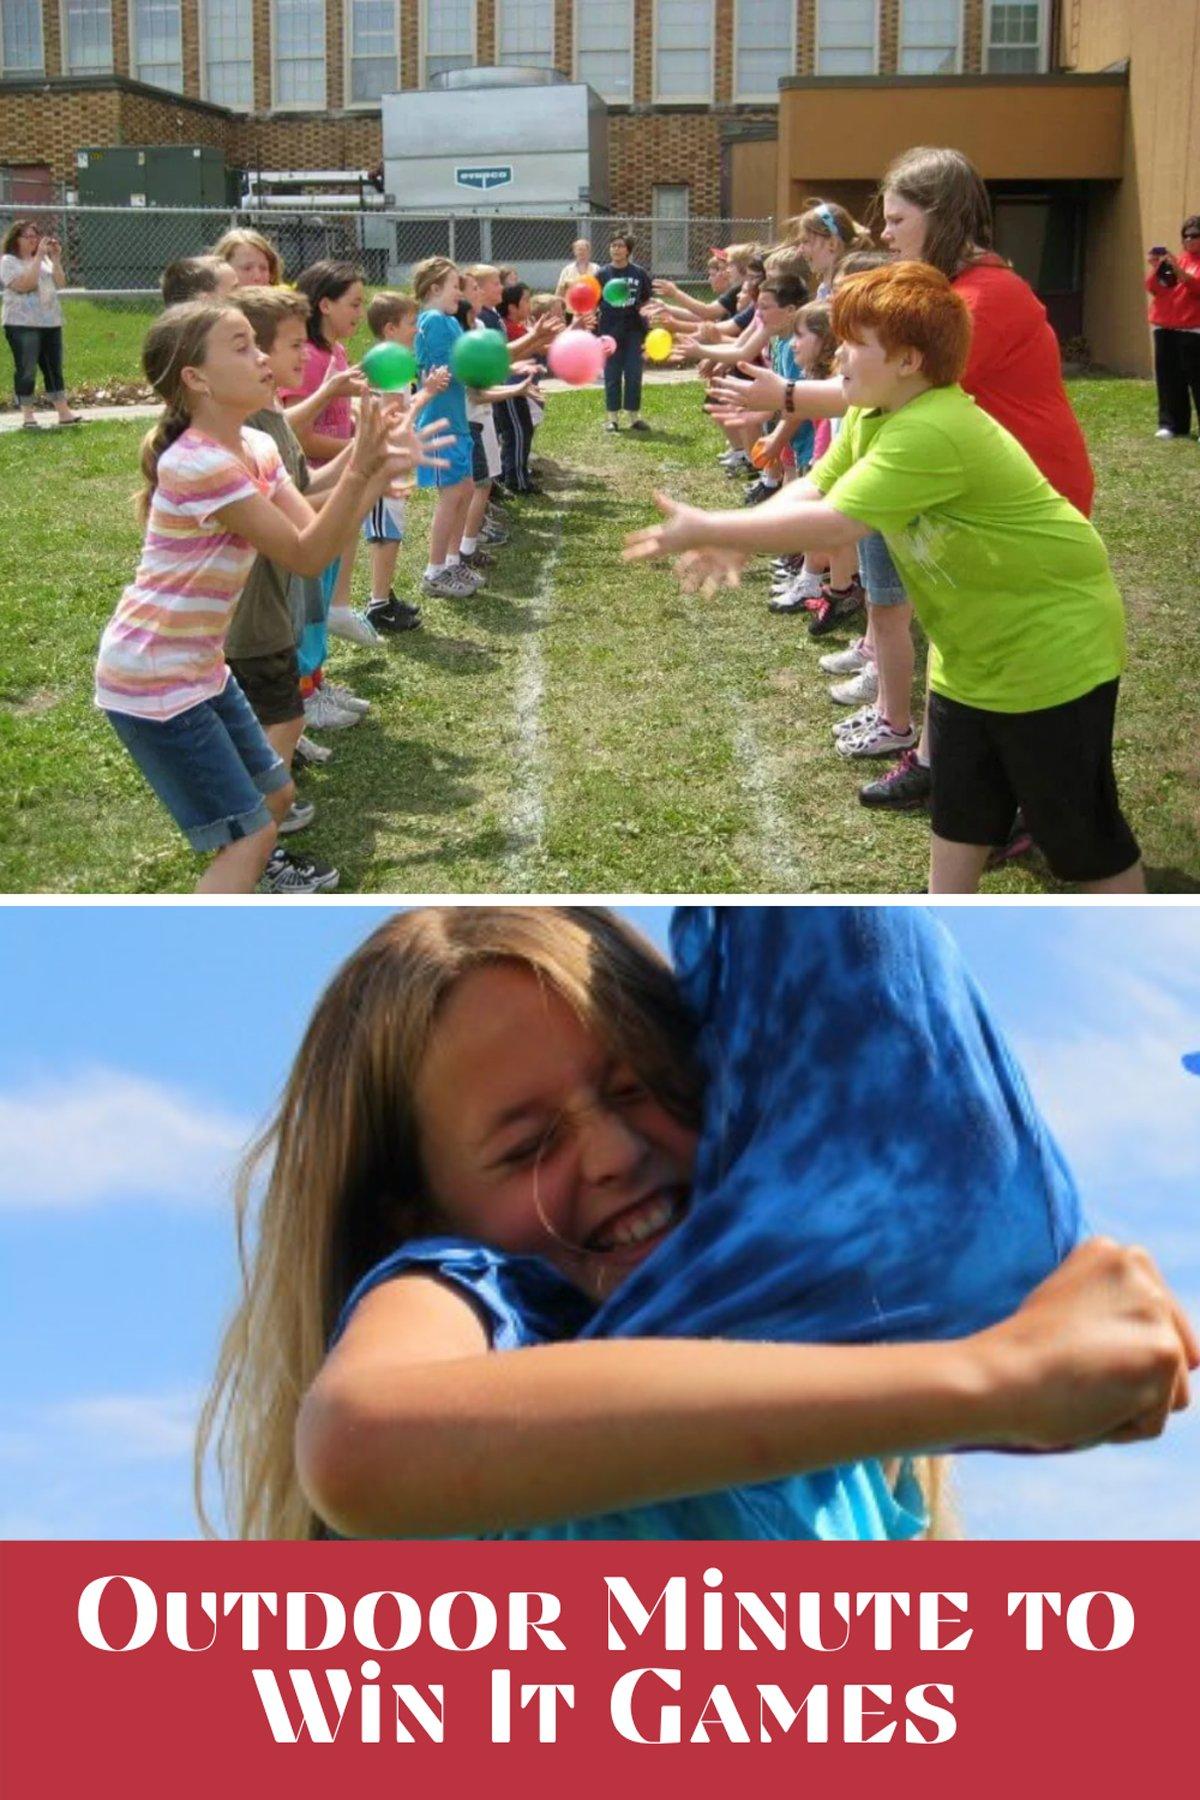 Outdoor Minute to Win It Games School Field Day